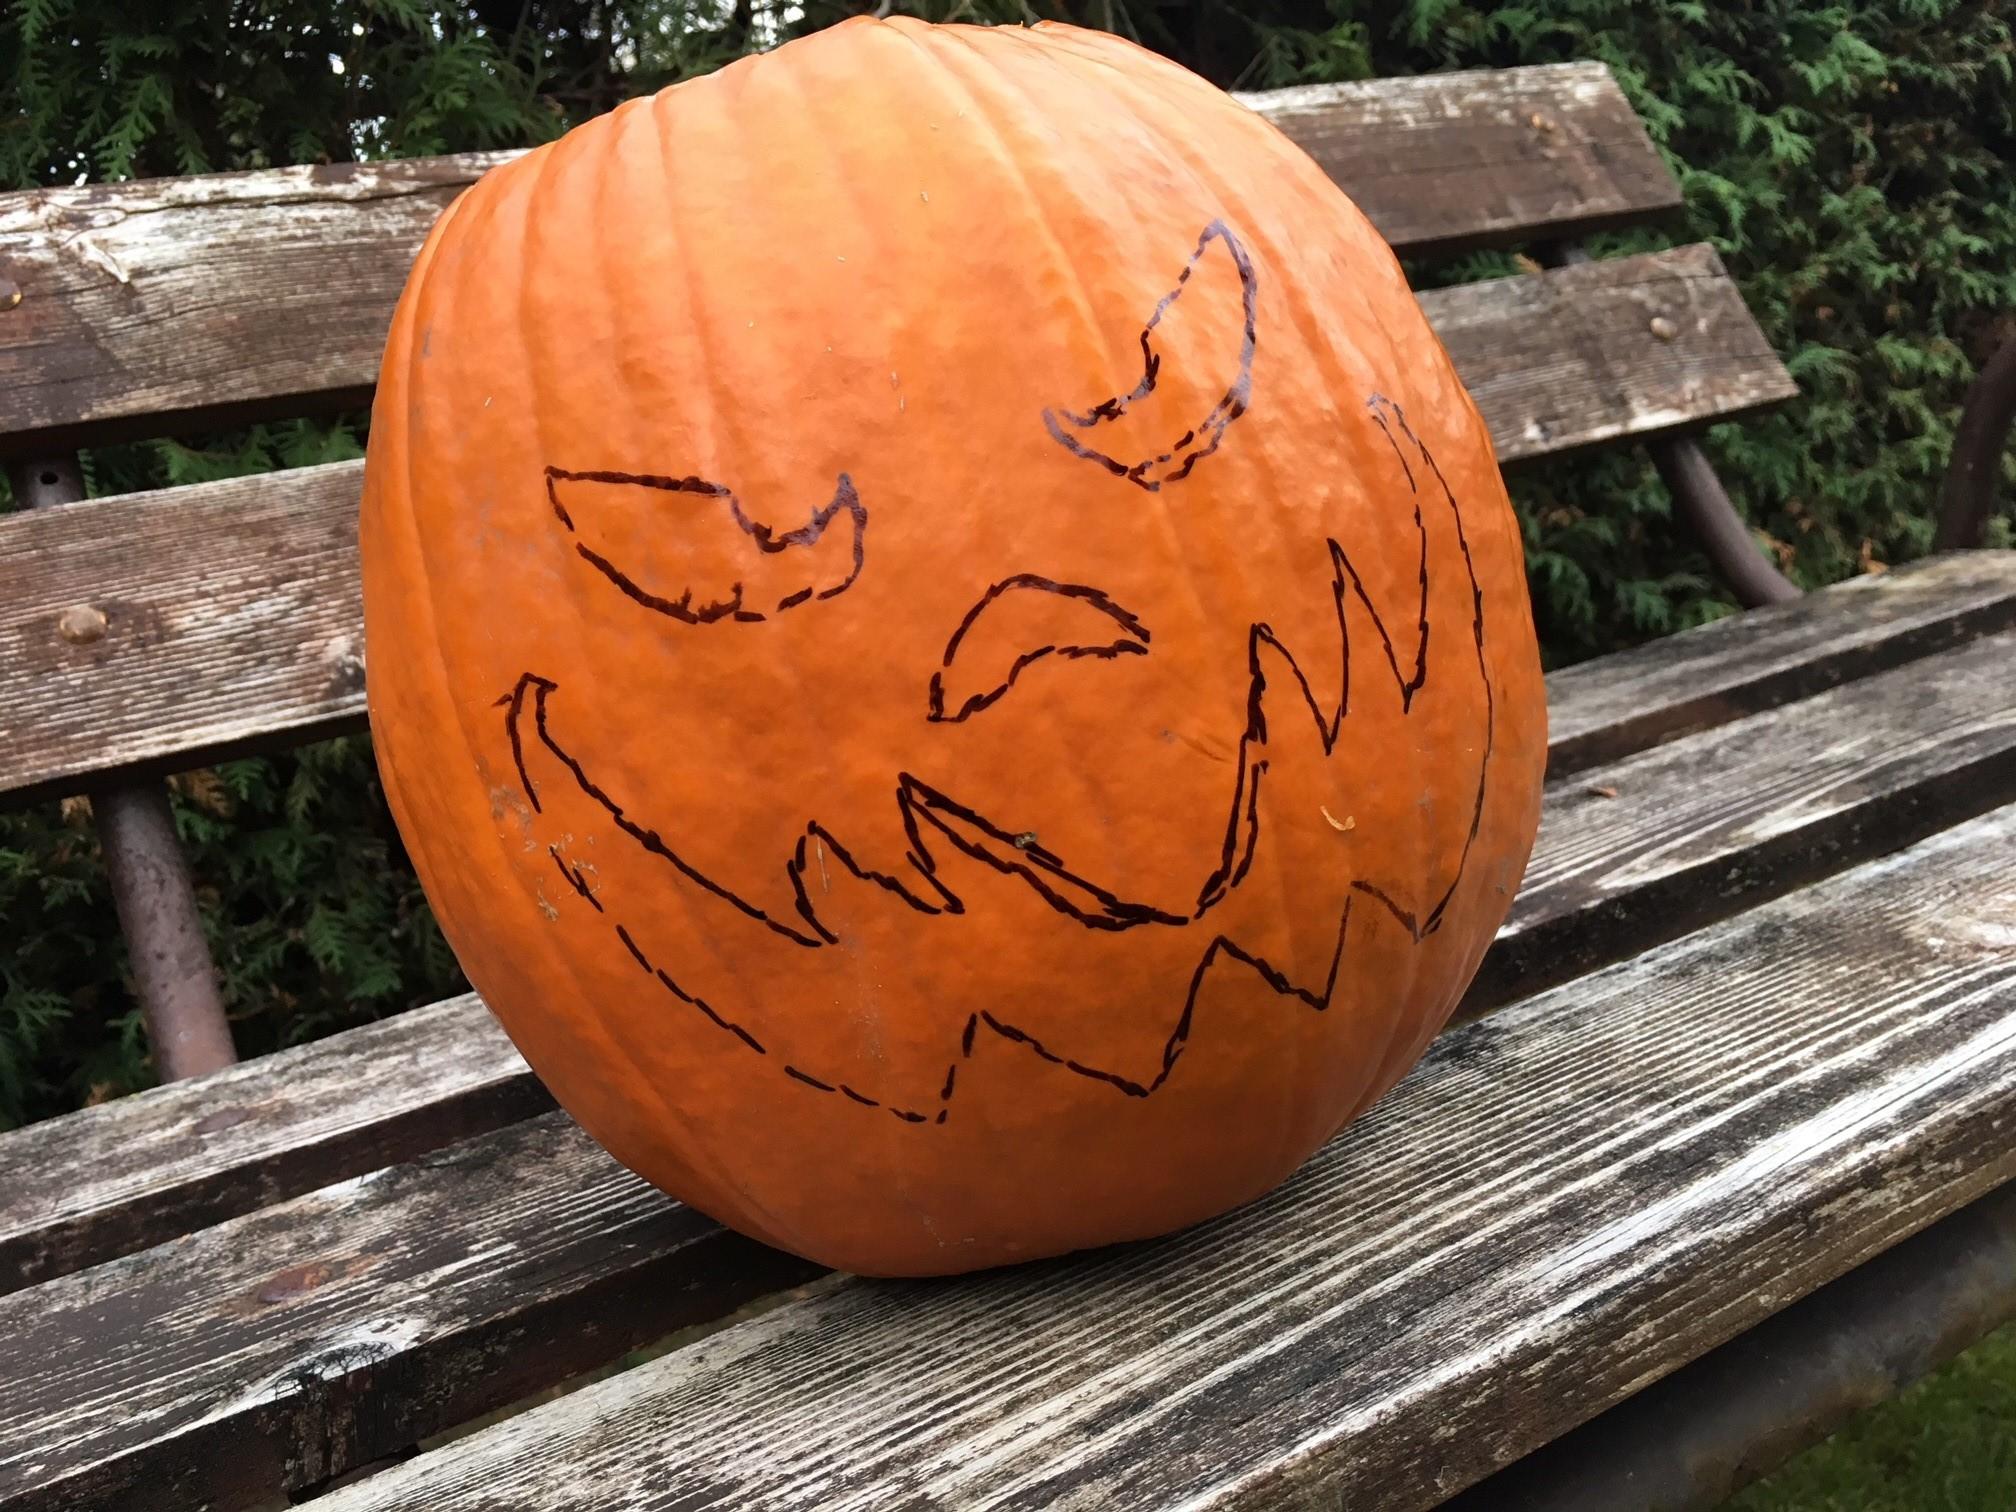 szmk_tok_pumpkin_boba_fett_star_wars_5.JPG